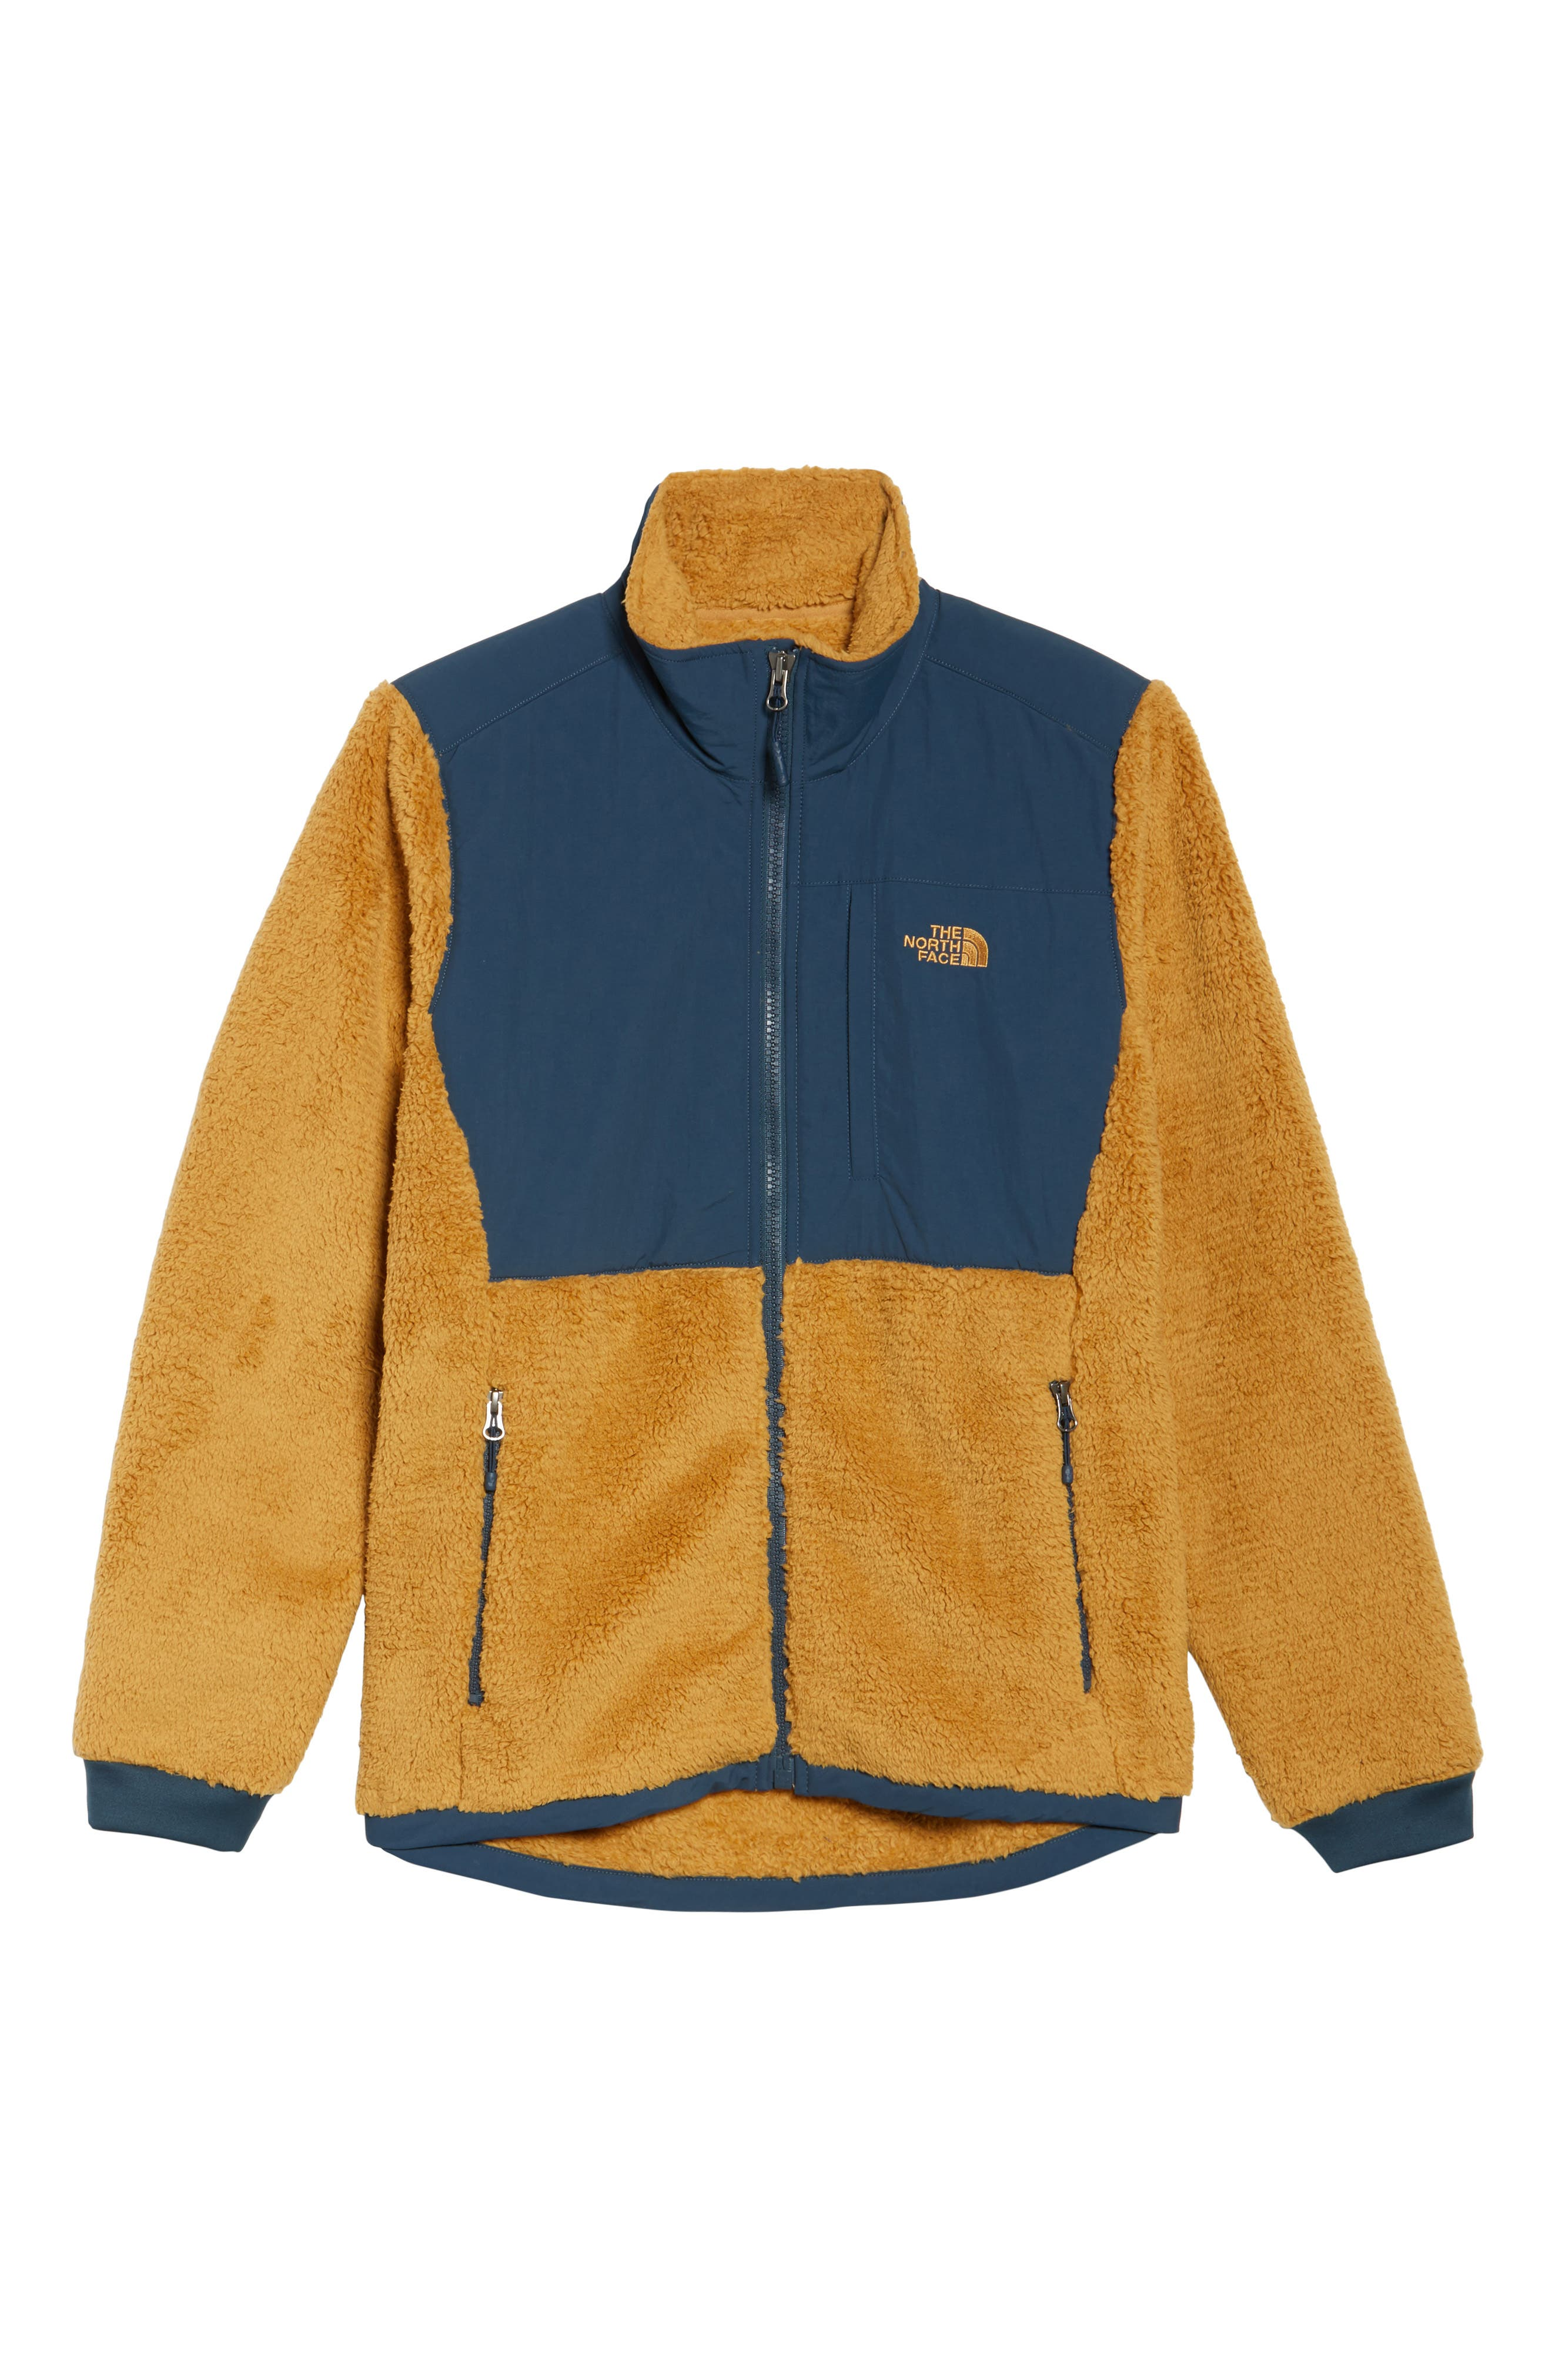 Novelty Denali Fleece Jacket,                             Alternate thumbnail 6, color,                             251